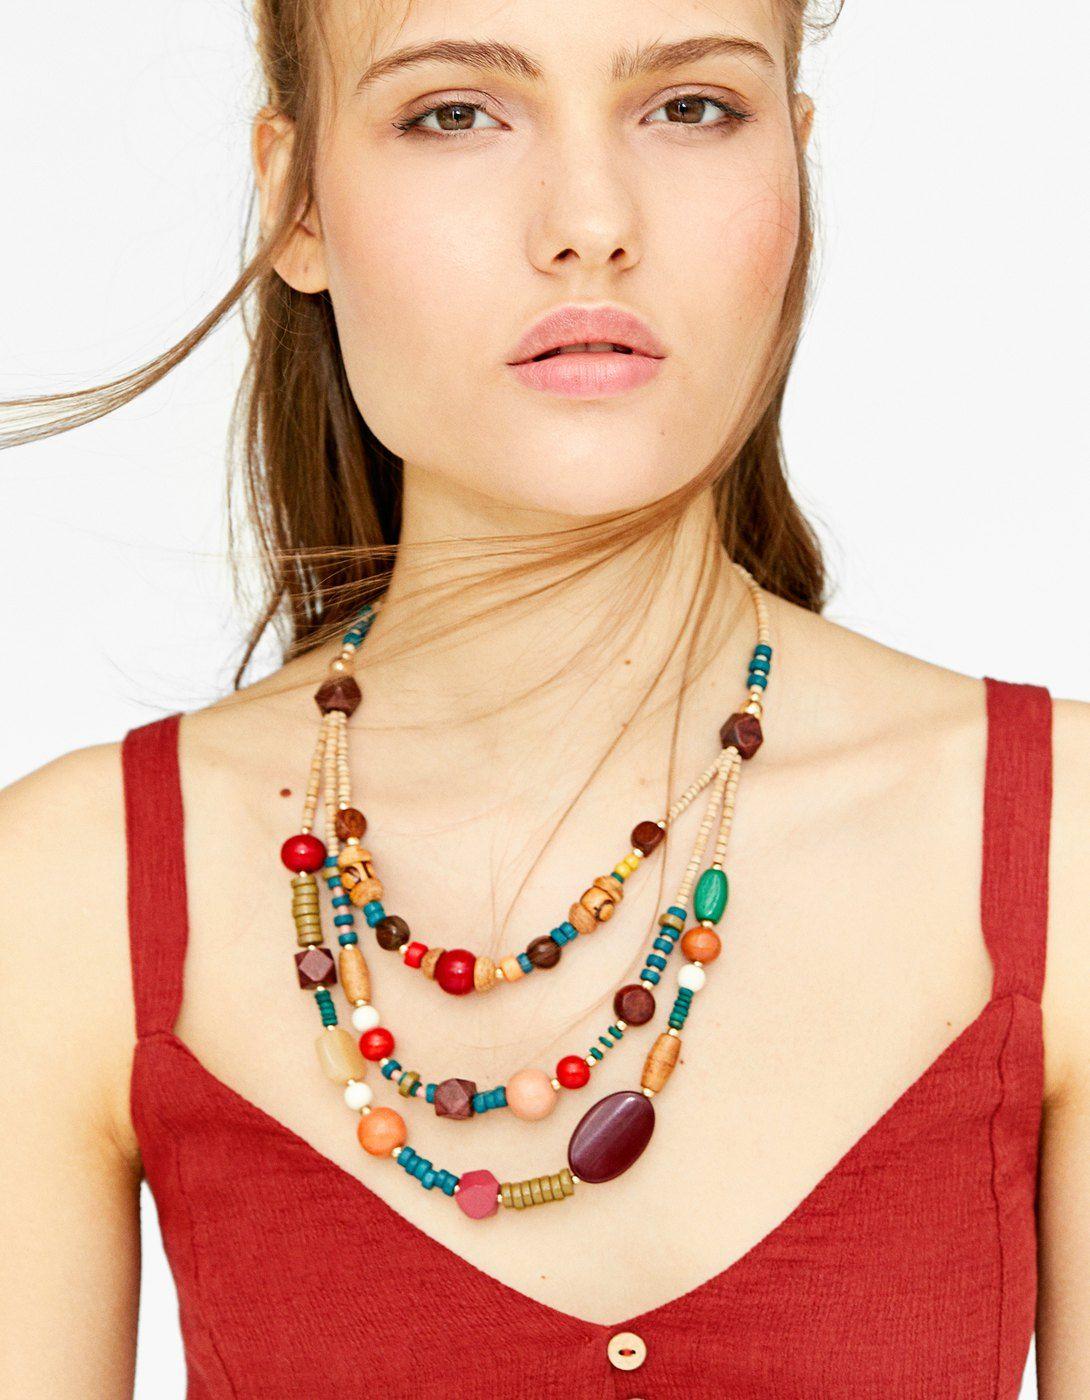 3d5d0dd58450 Descubre los collares tendencia 2019. Bisutería de moda bershka ...